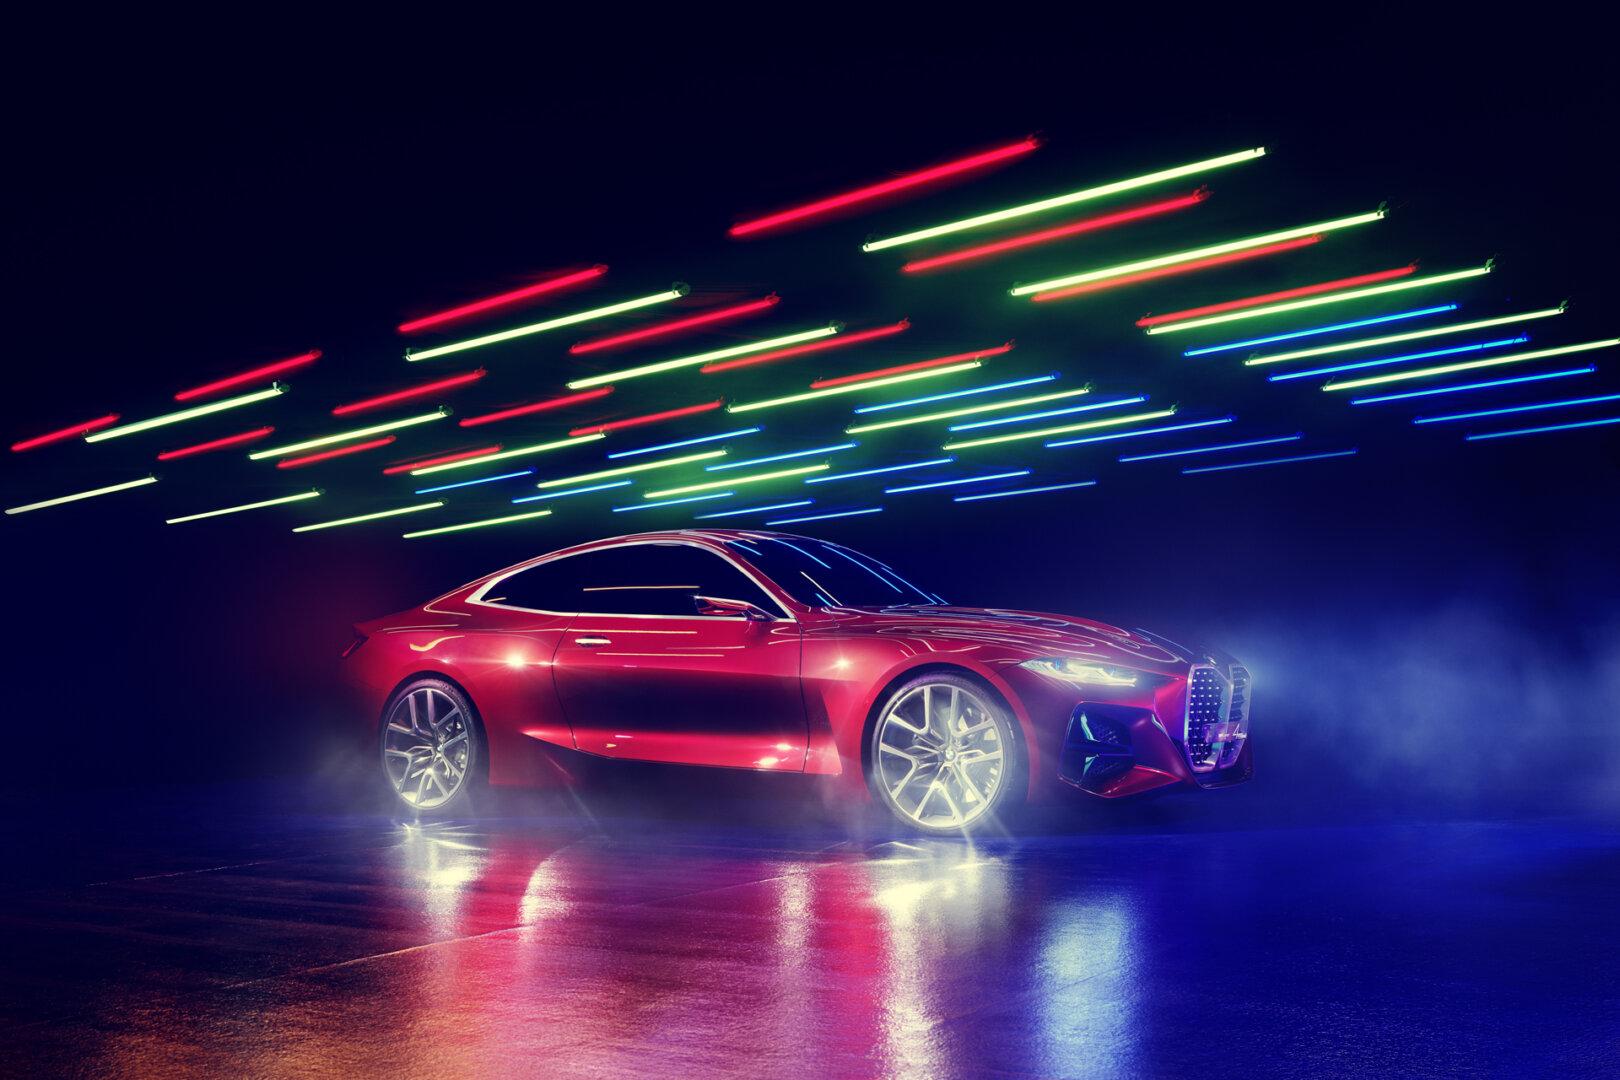 Roter BMW Concept 4 Elektroauto